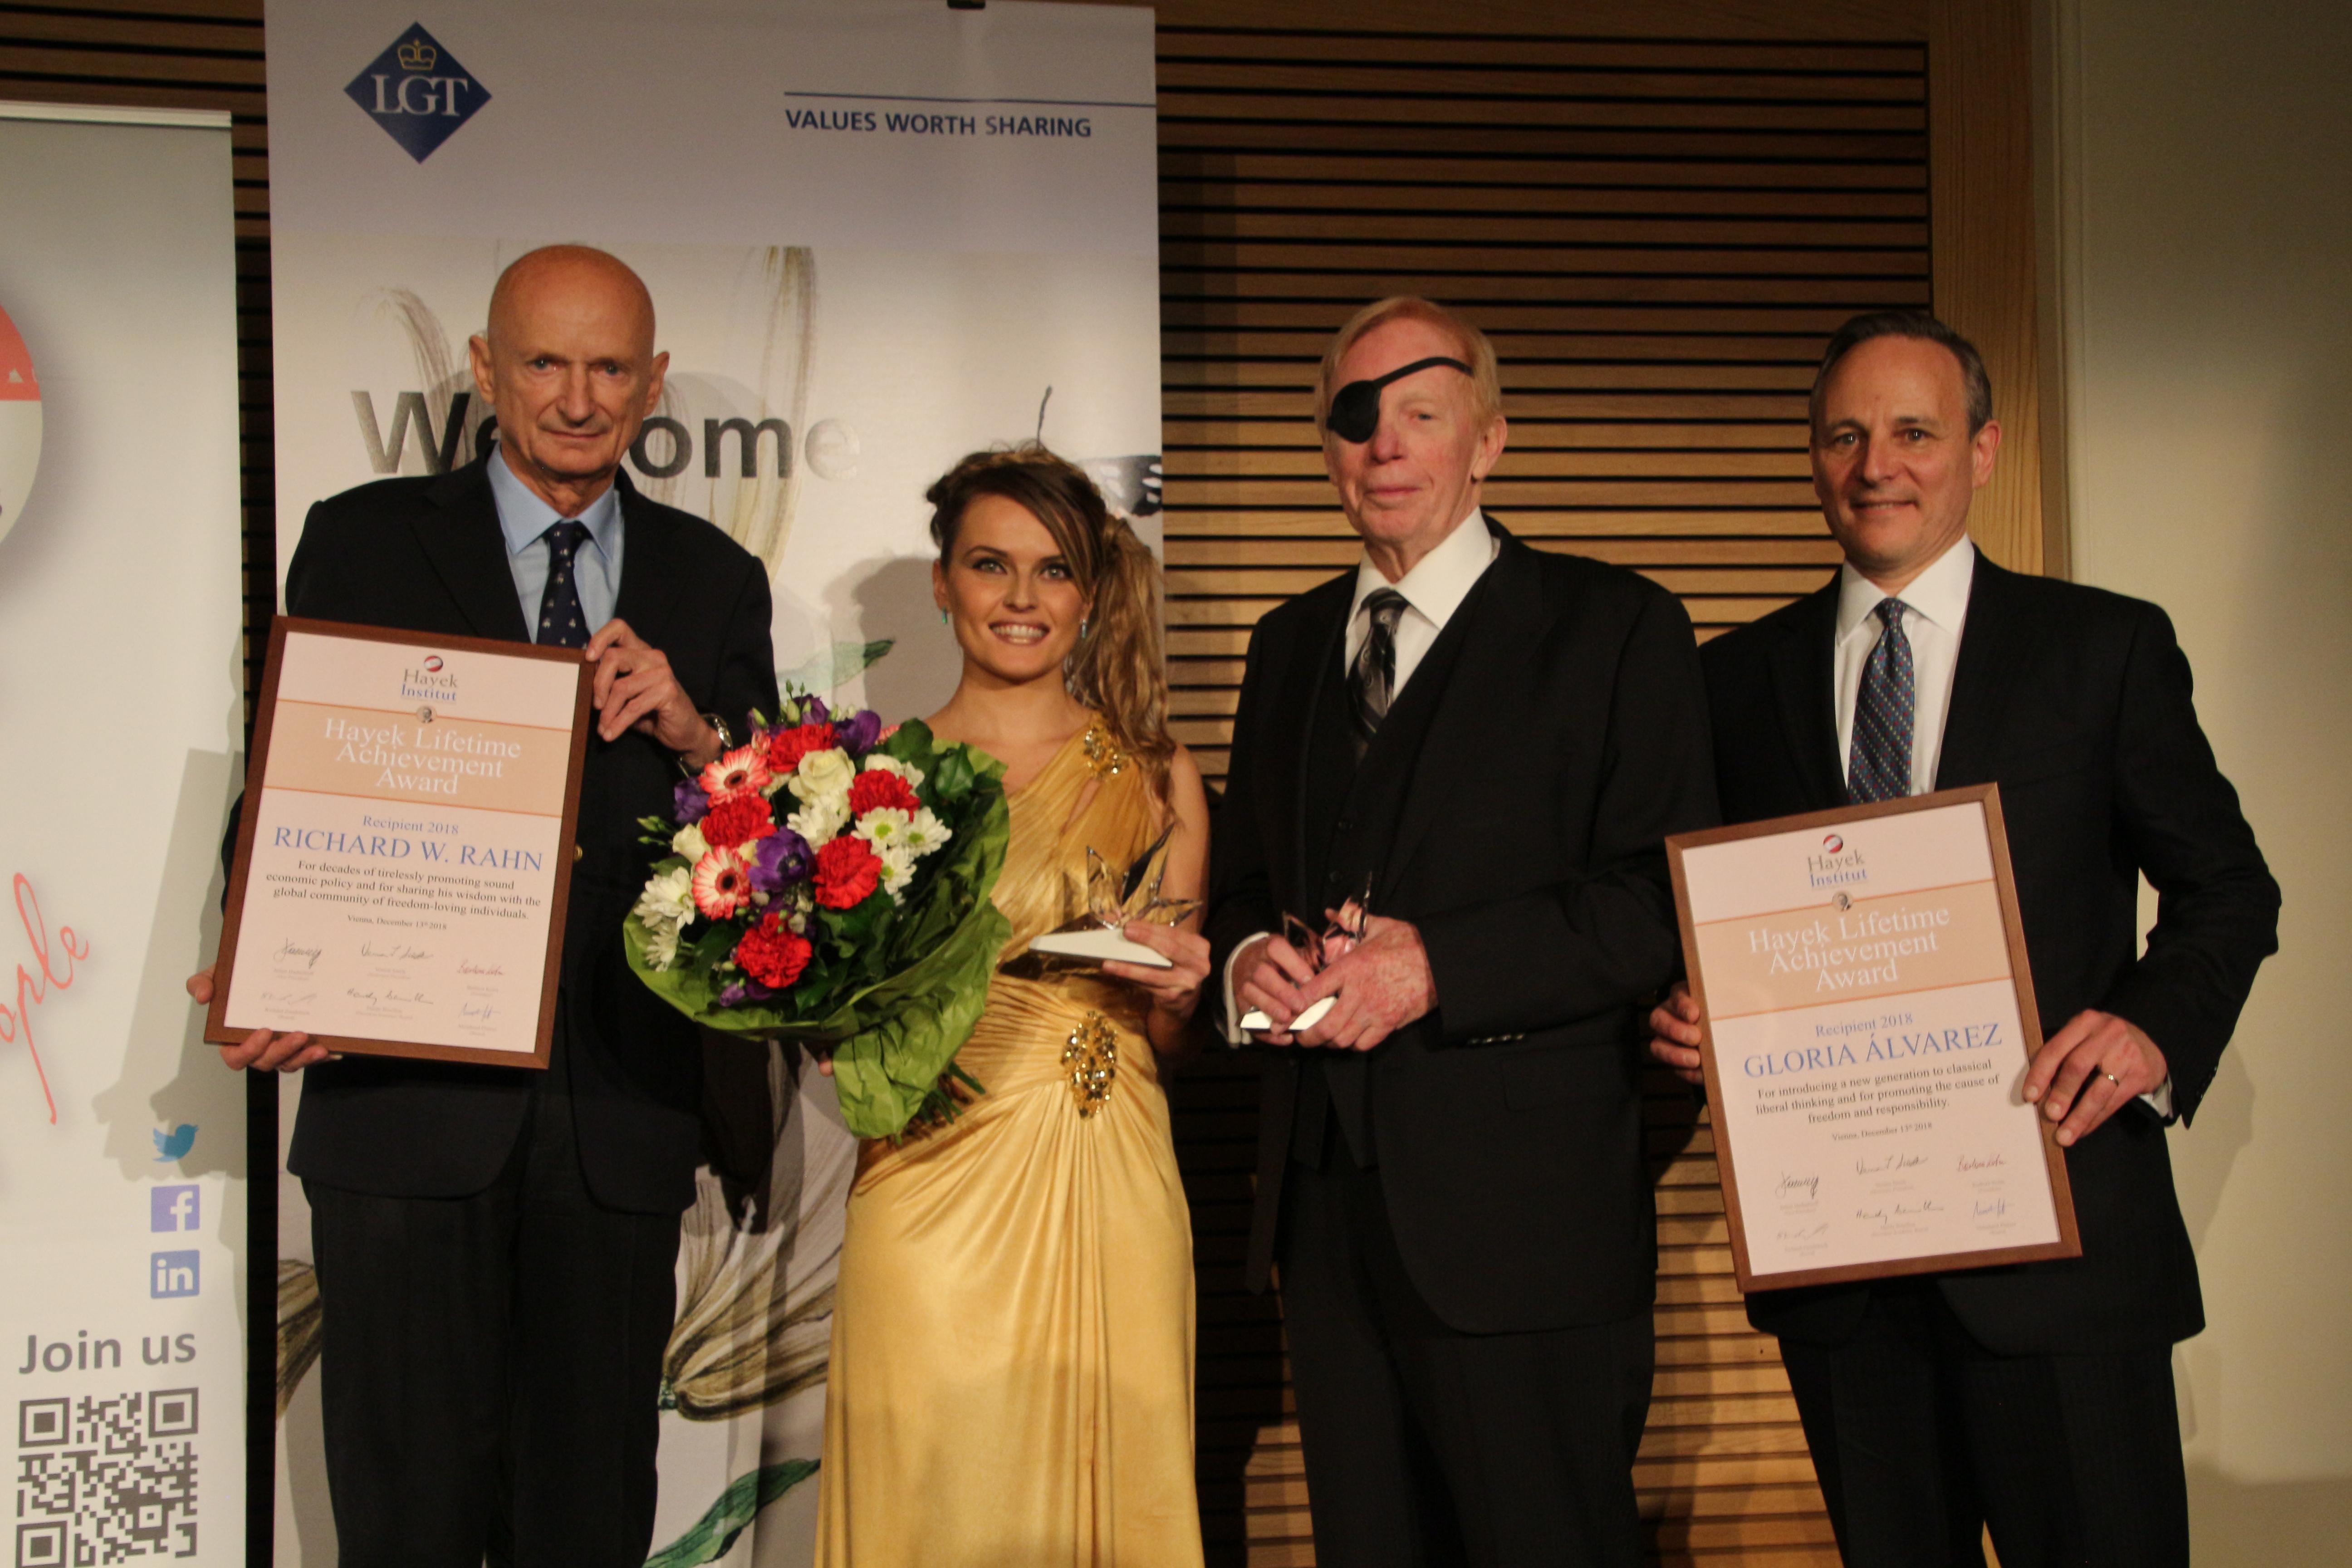 Prinz Michael v. Lichtenstein, Gloria Álvarez, Dr. Richard Rahn, Lawrence Goodman